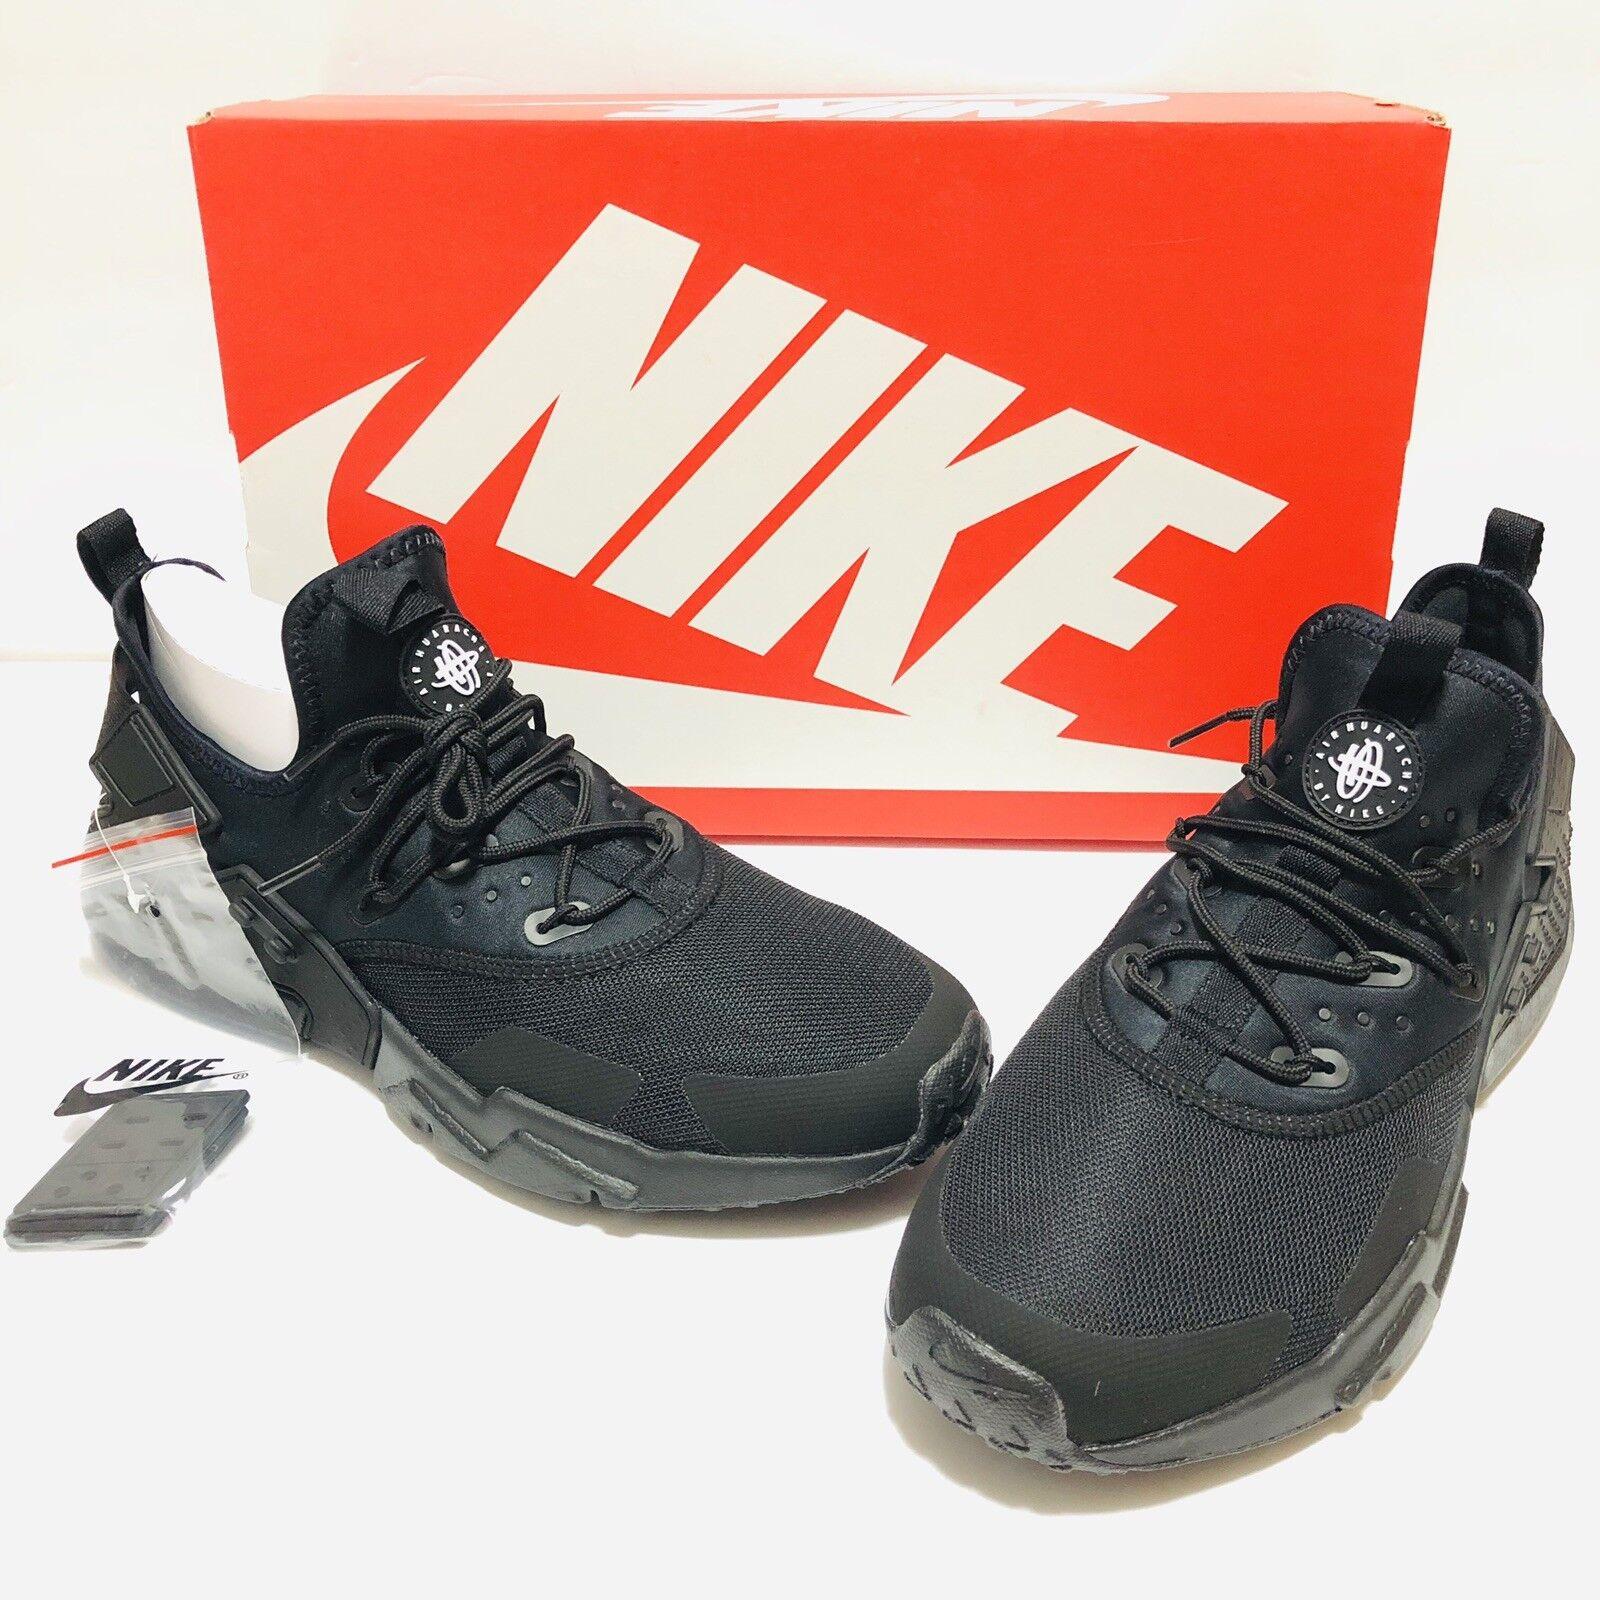 DS Nike Air Max 90 Ultra 2.0 Cargo Khaki Olive Sz 10 924447 300